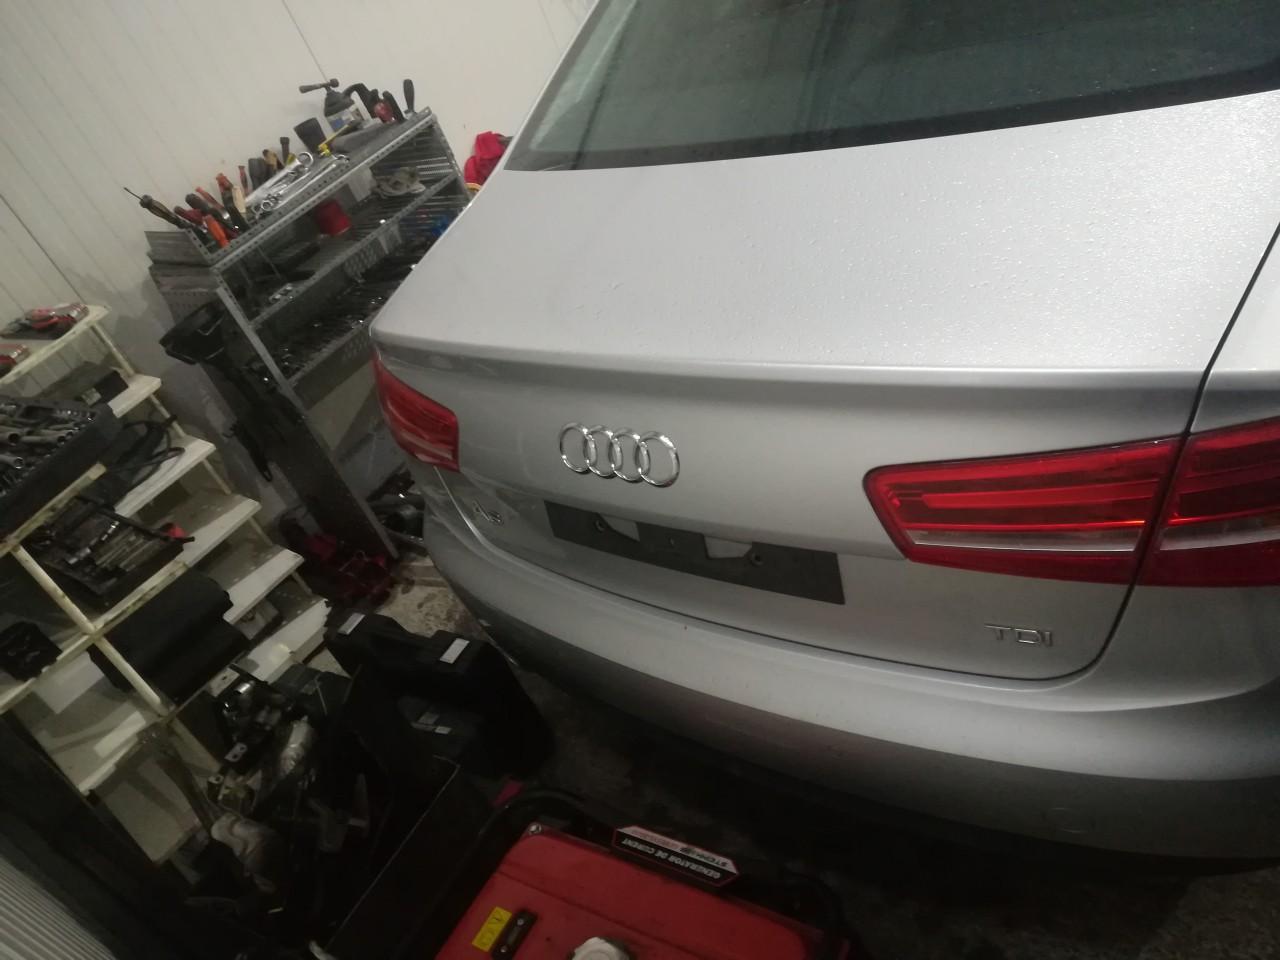 Dezmembrez Audi A6 4G C7 2.0 TDI 130kw motor CGL CGLC 2012 2013 2014 2015